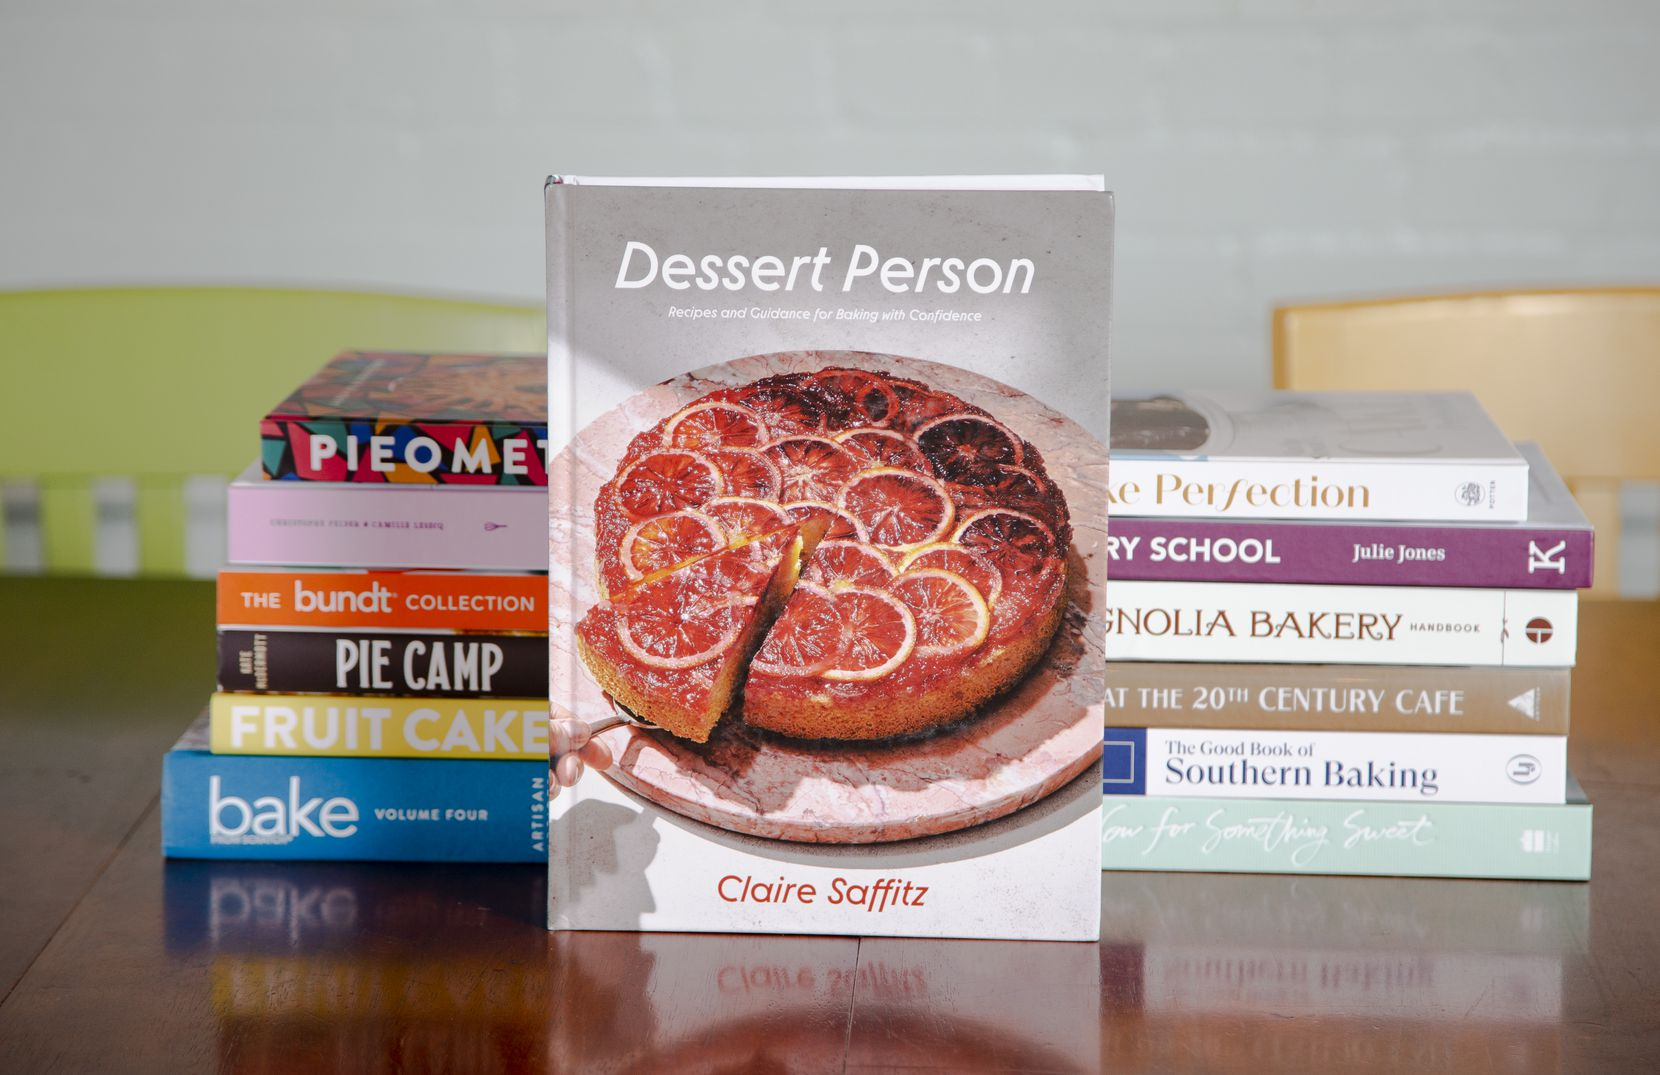 Personne de dessert